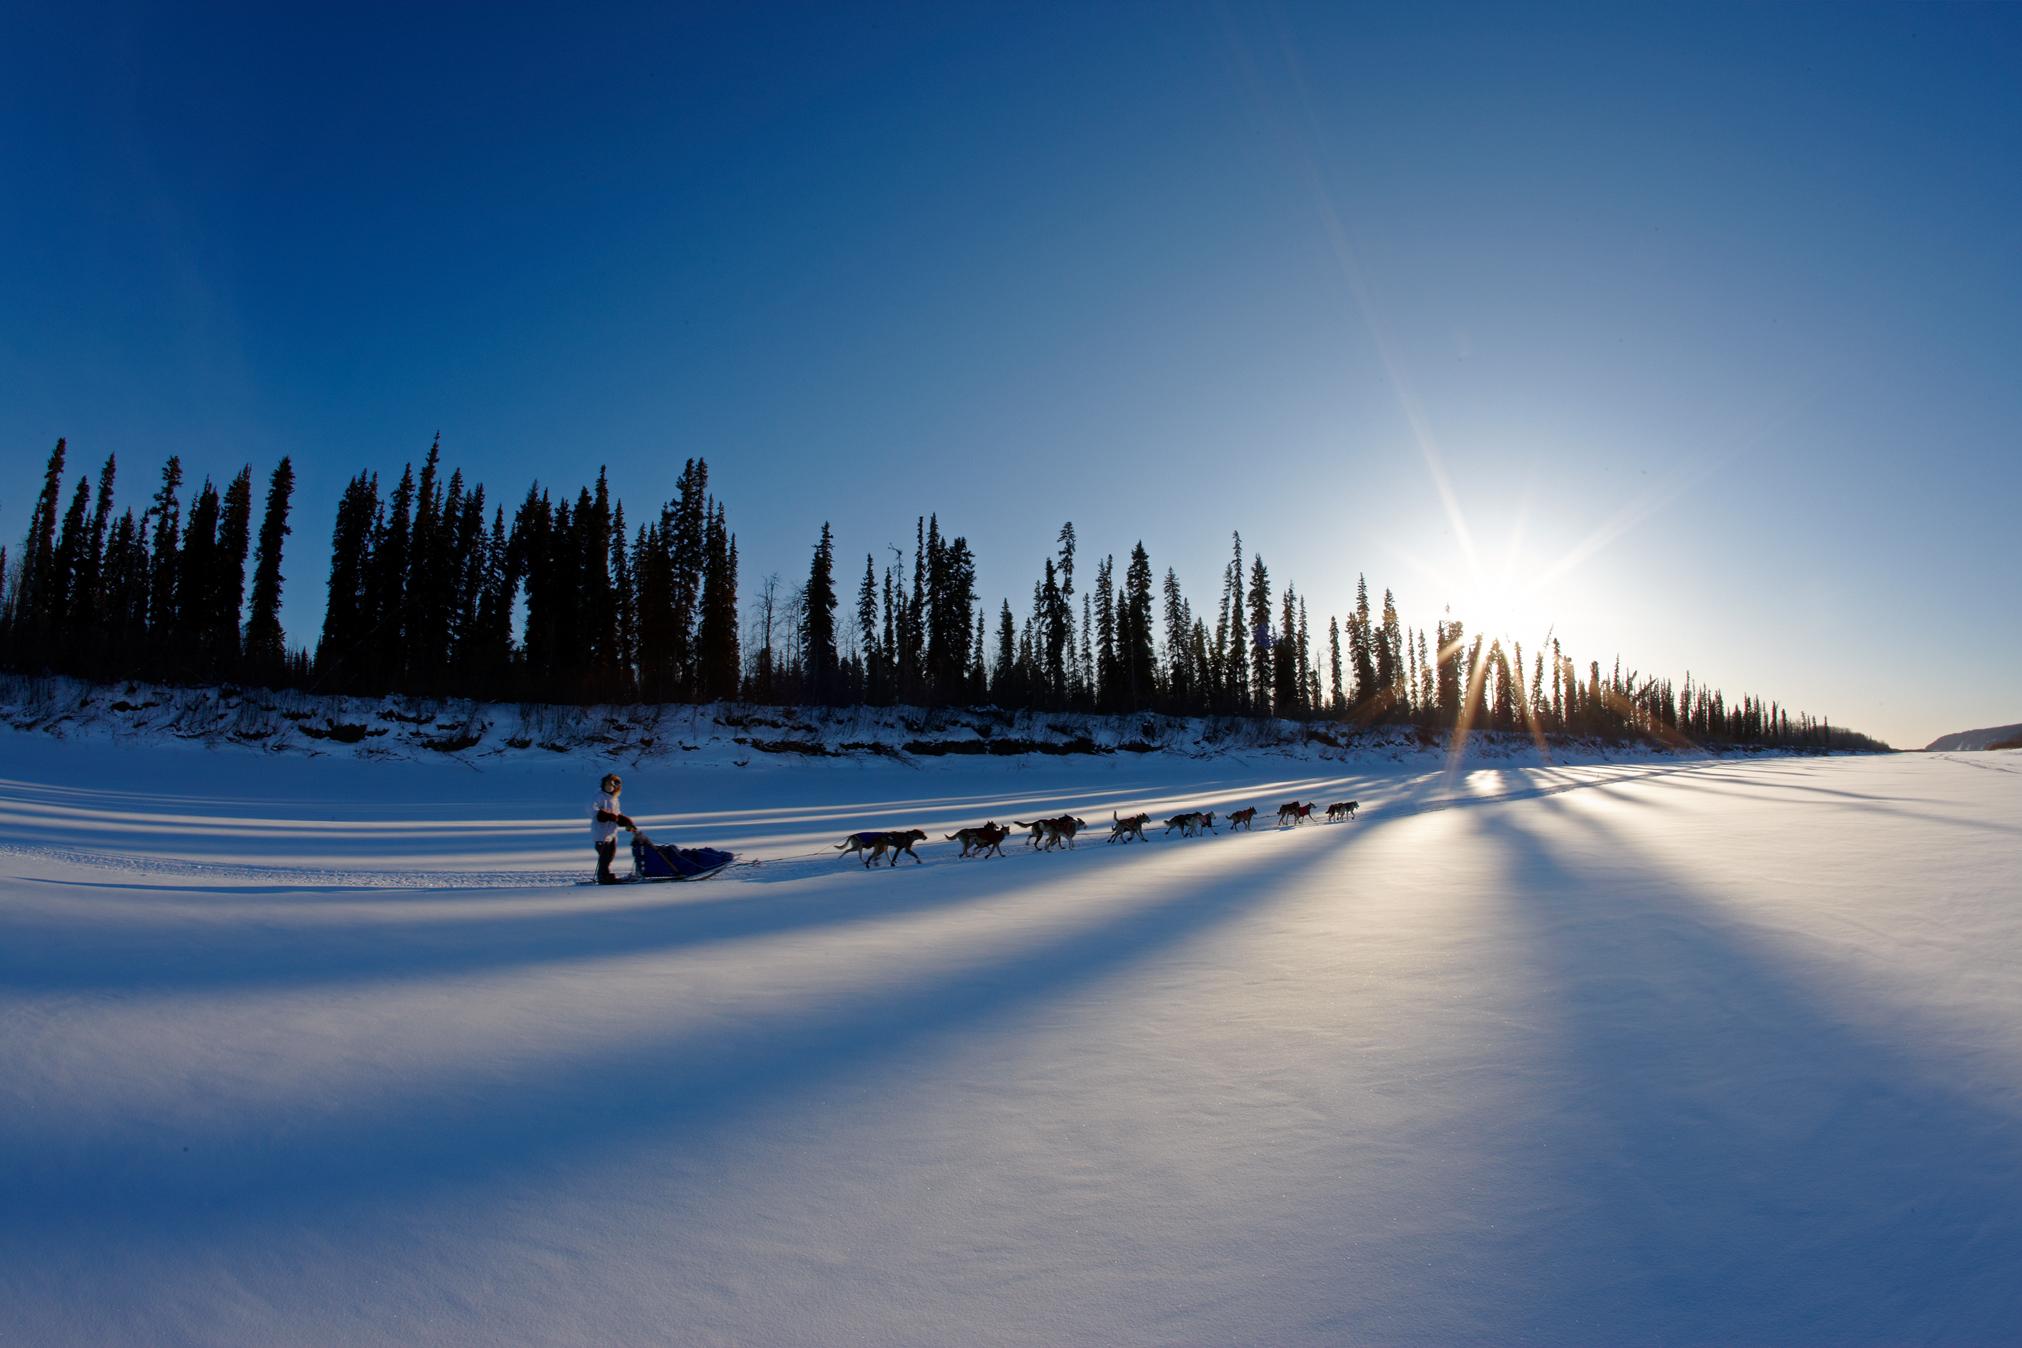 Iditarod dog sled race, Yukon River, Galena, Alaska